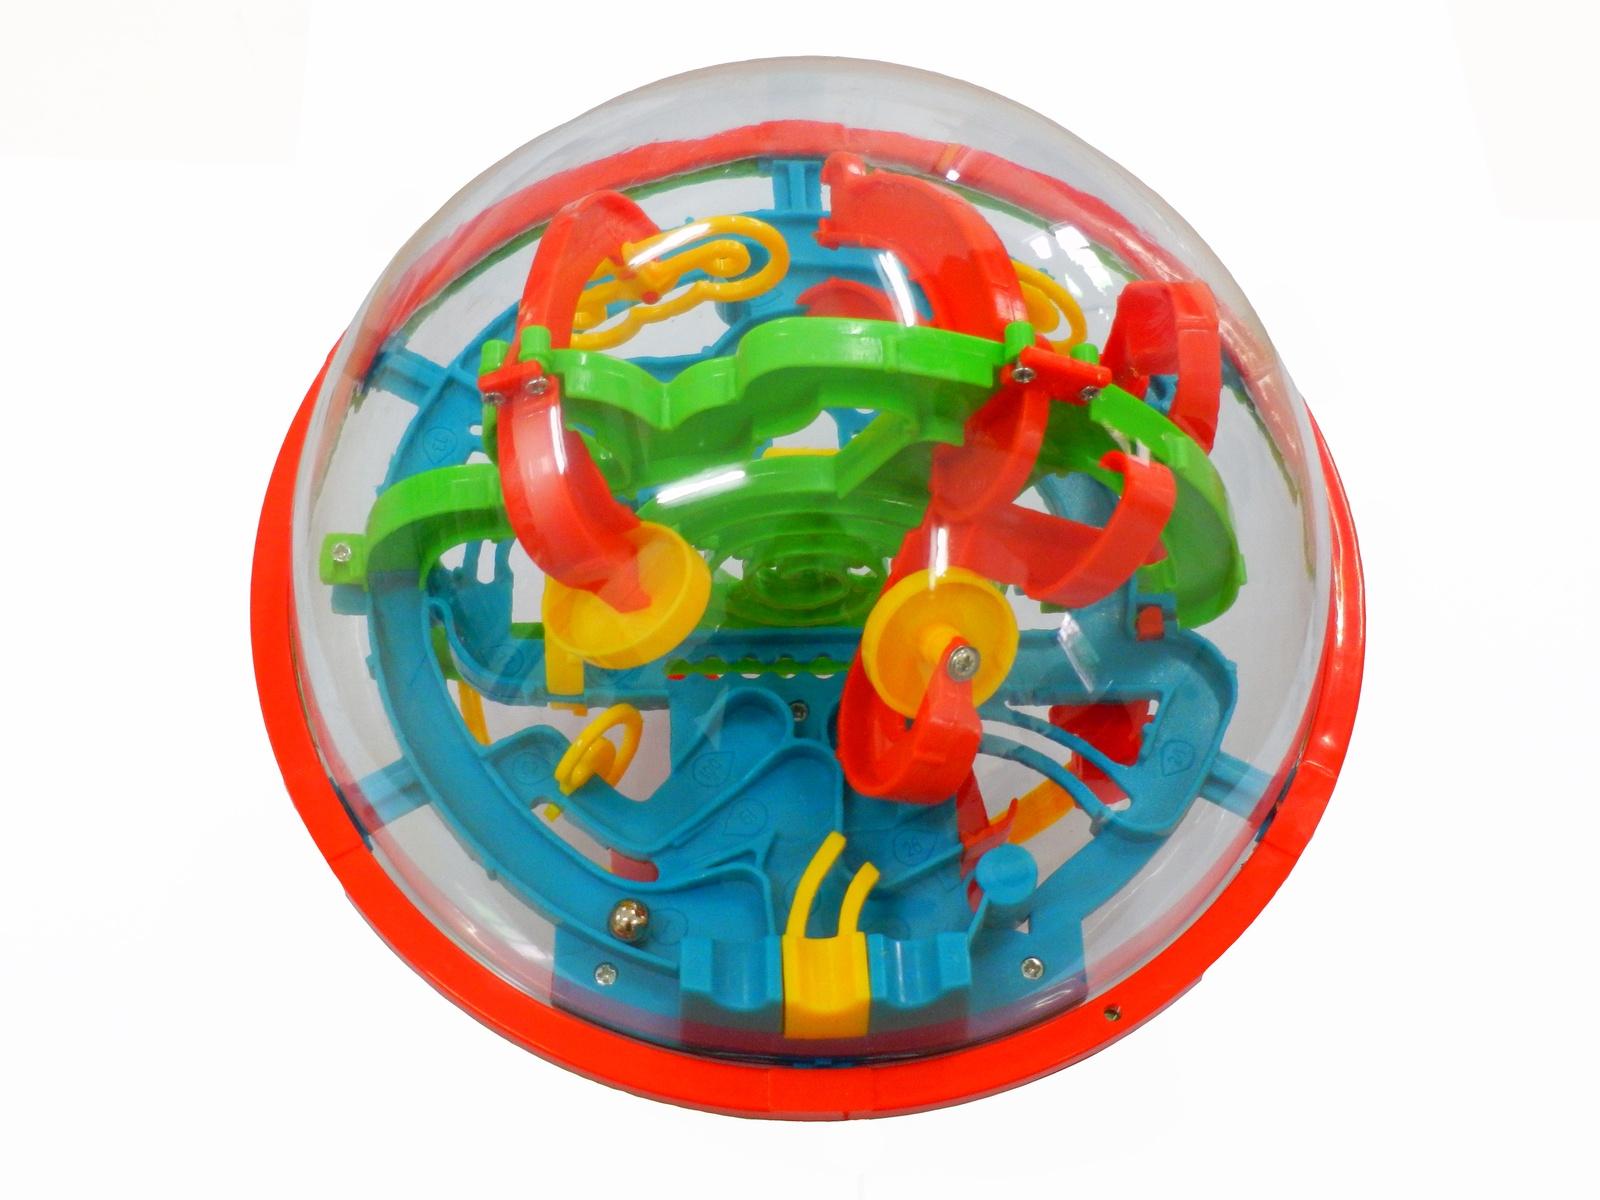 "Лабиринт Icoy Toys головоломка ""Шар-лабиринт"" 100 шагов 21 см прозрачный"